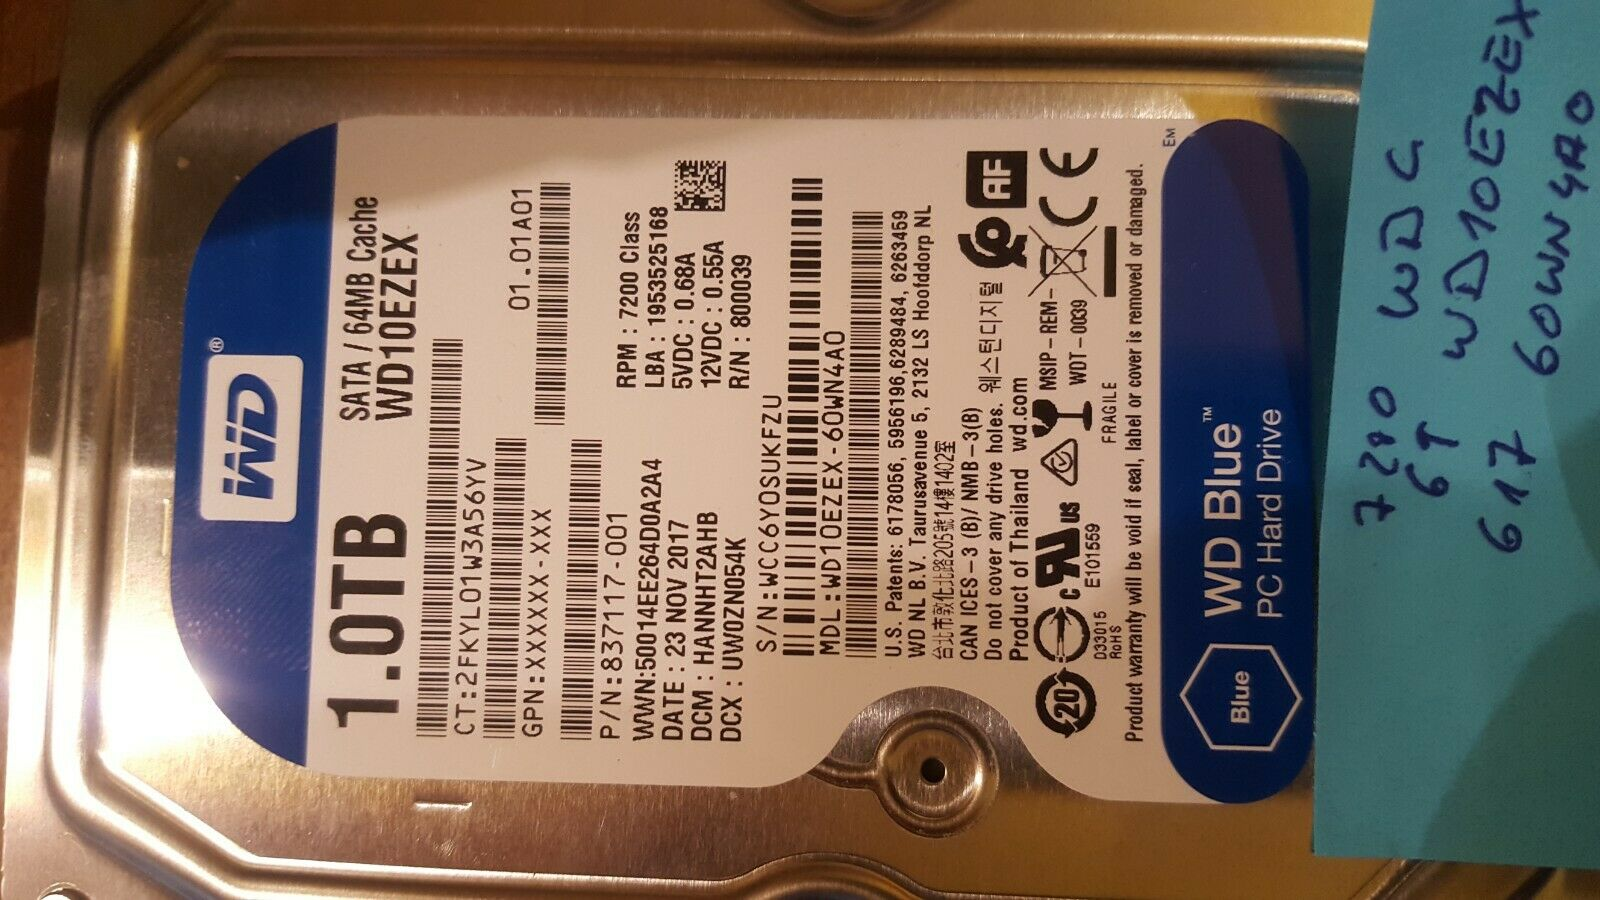 WD Blue  WD10EZEX 1.0TB  Festplatte HDD SATA 64MB Cache  7200RPM von 2017